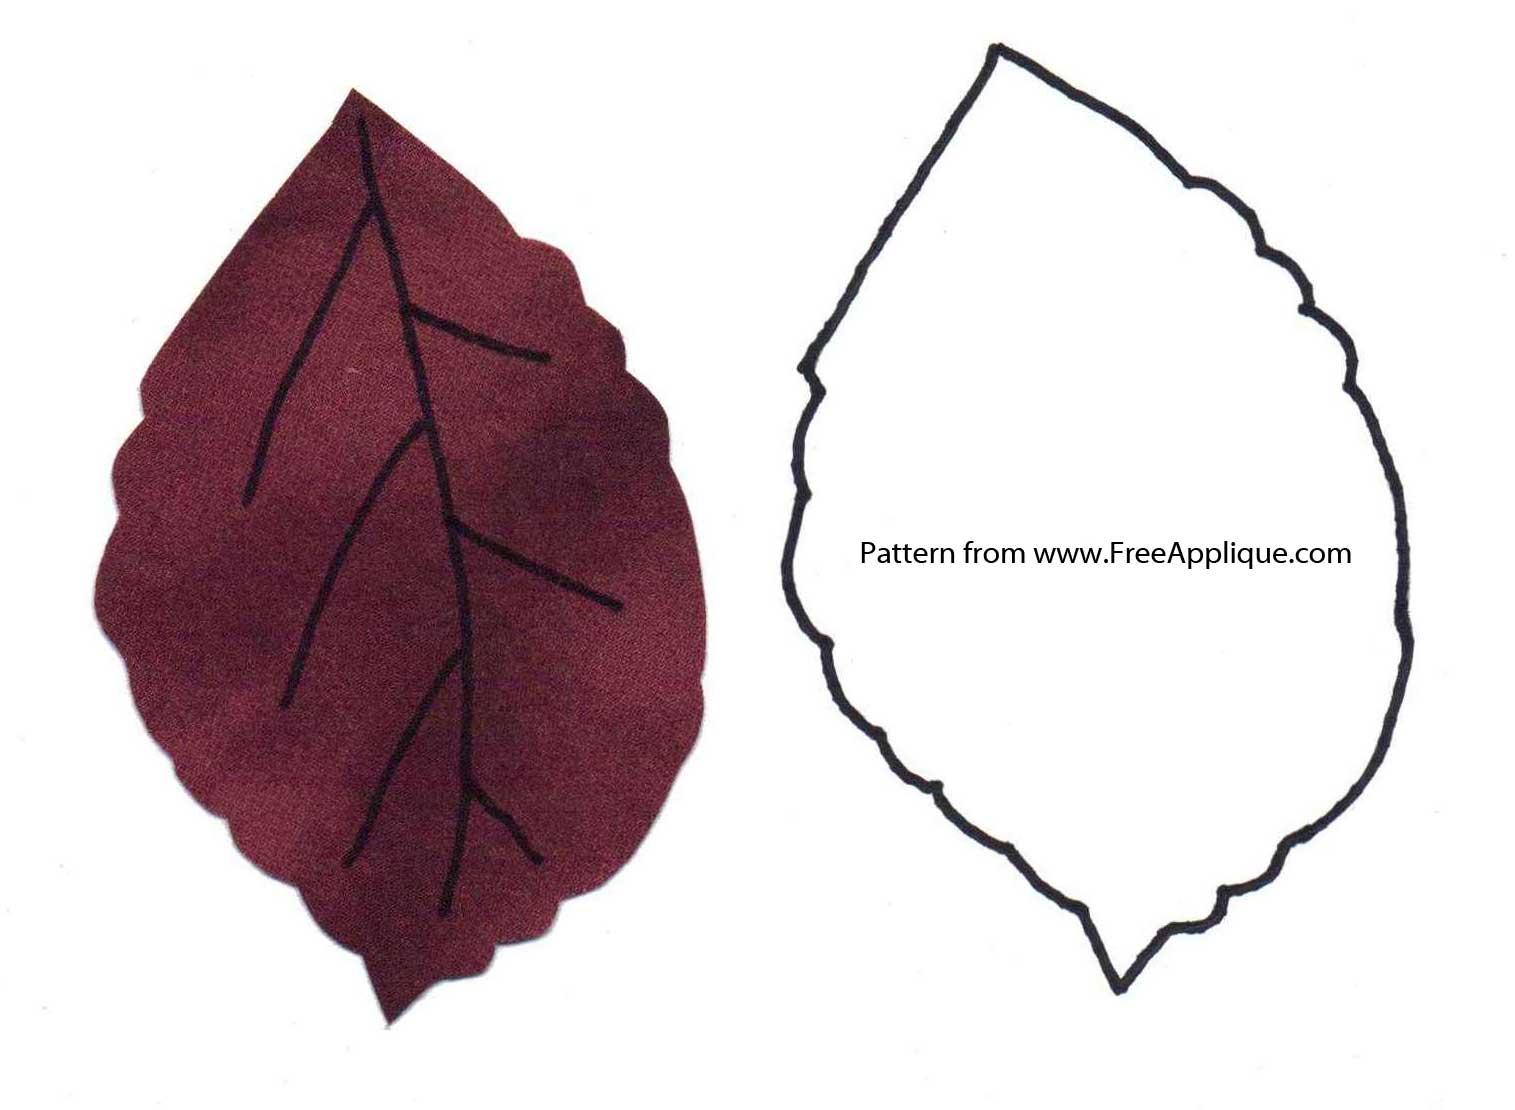 Leaf patterns clipart clip art freeuse download Printable Leaf Patterns for Applique, Quilting, Crafts or Clipart clip art freeuse download